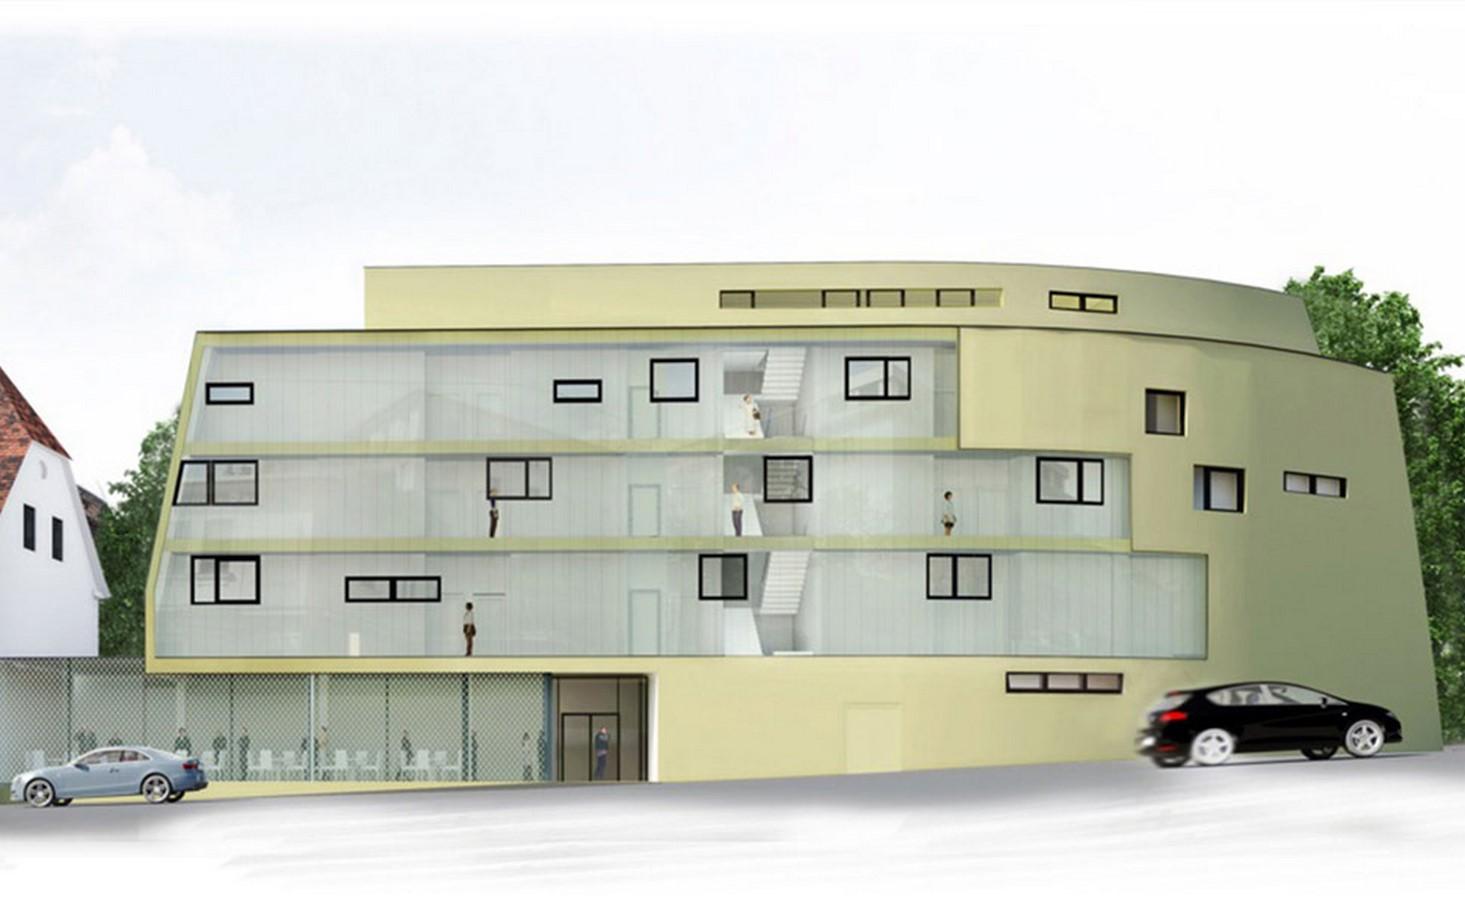 Architects in Graz - Top 40 Architects in Graz - Sheet7